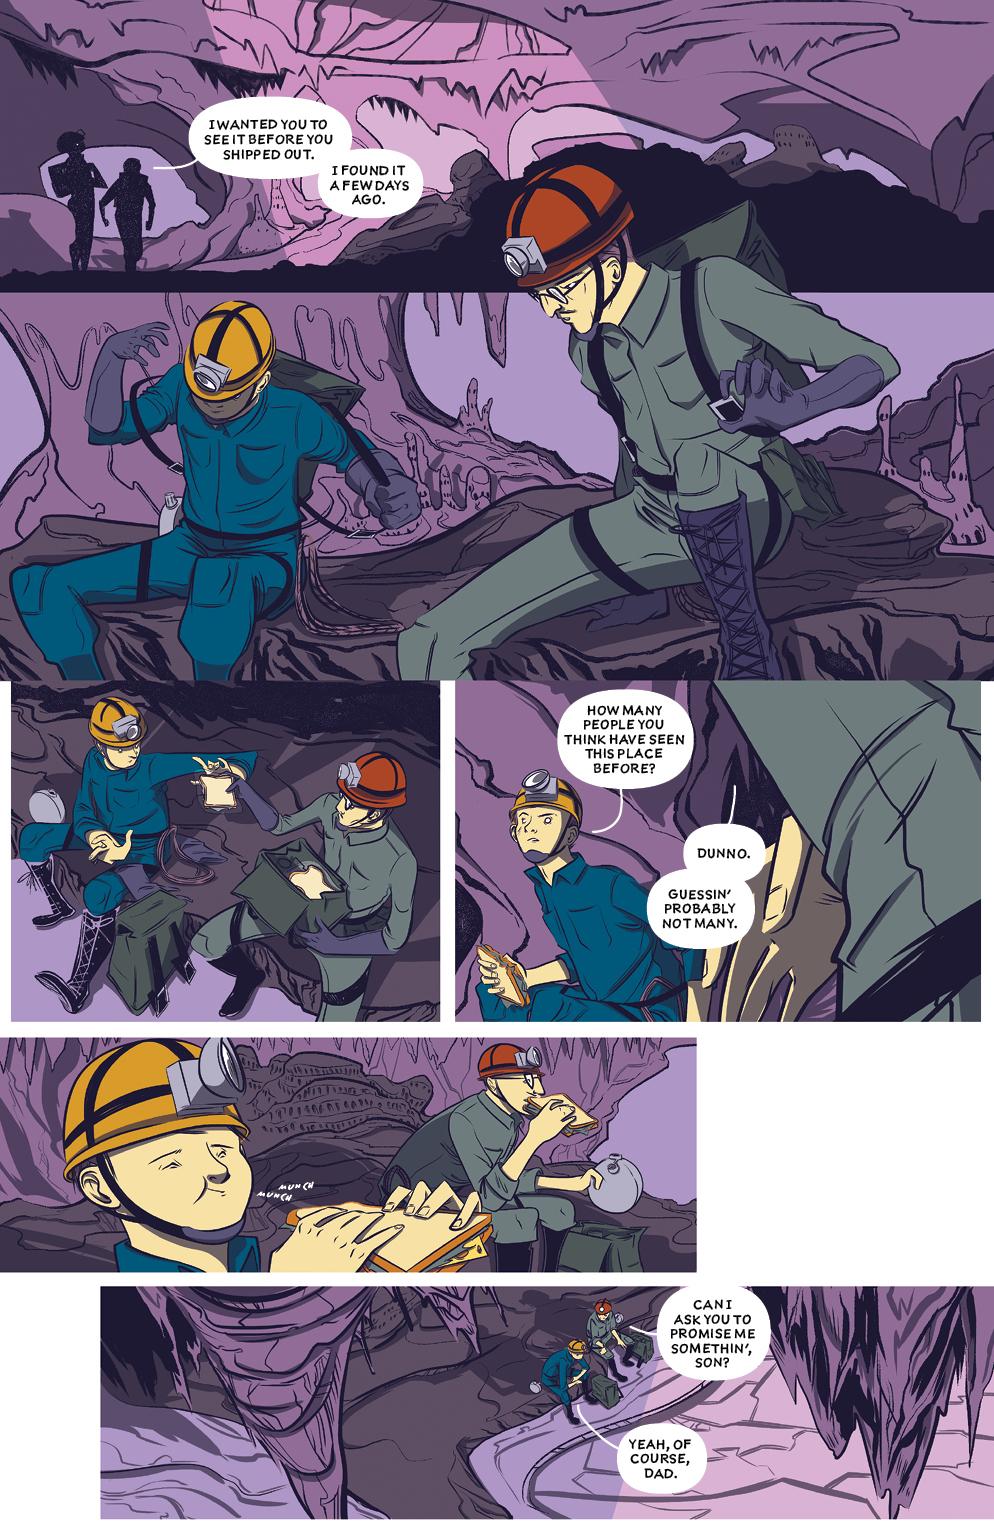 TunnelRat_Issue13.jpg